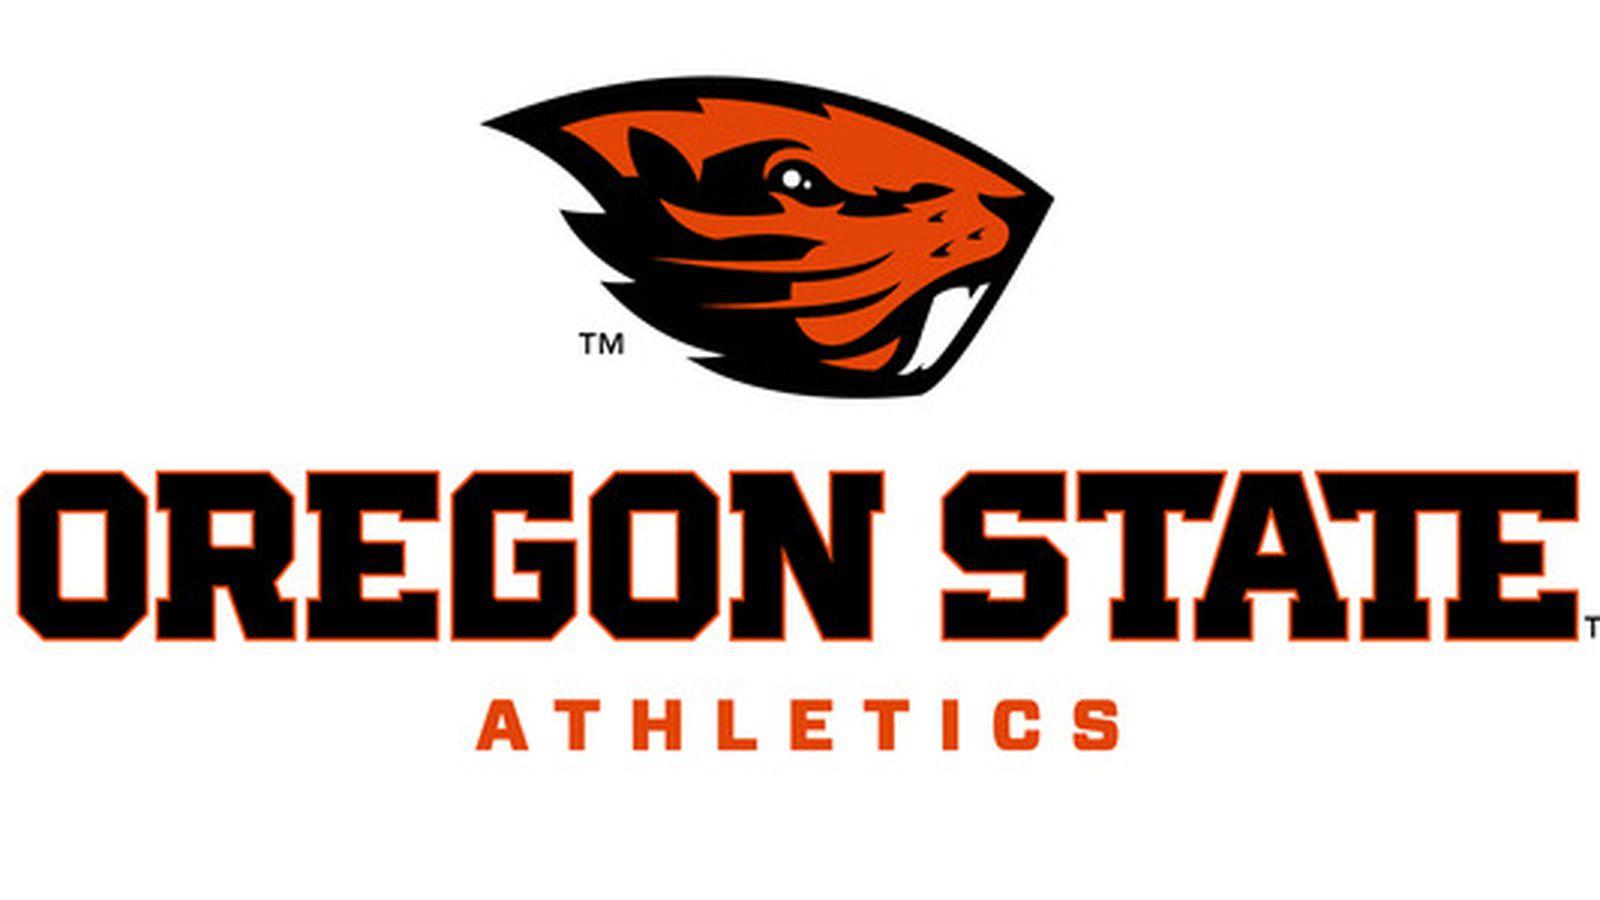 New Oregon State logo, football uniforms revealed ...